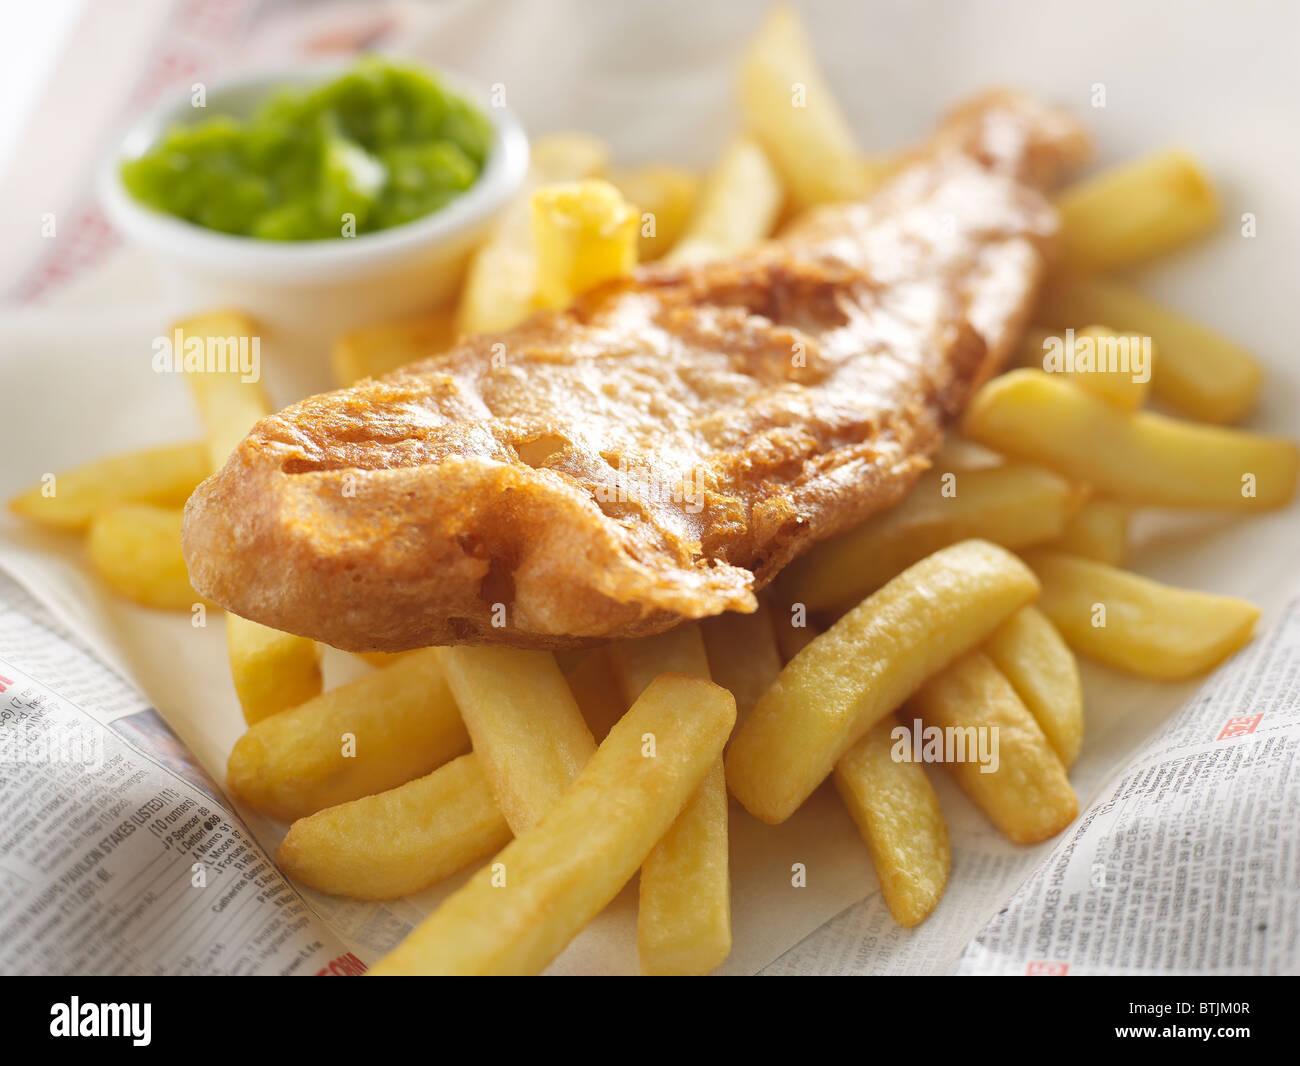 Poisson et frites à emporter Photo Stock